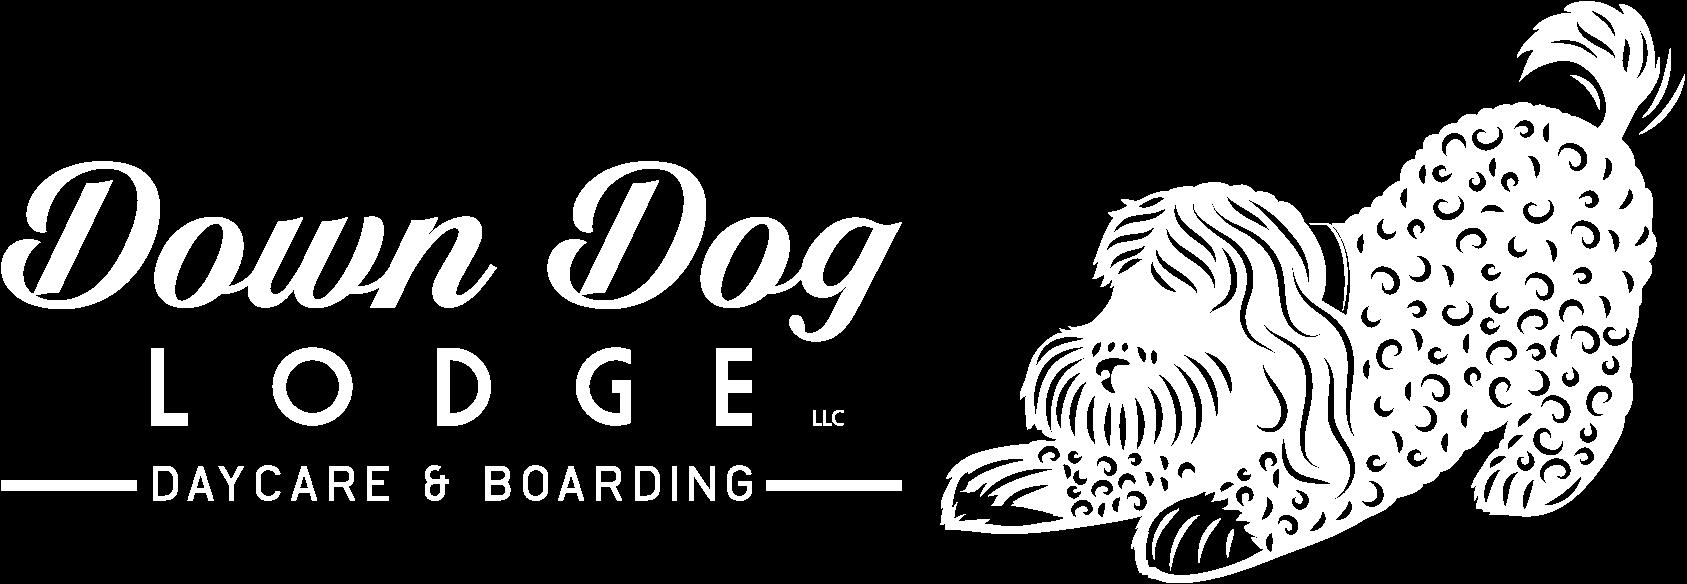 Down Dog Lodge Logo Rework